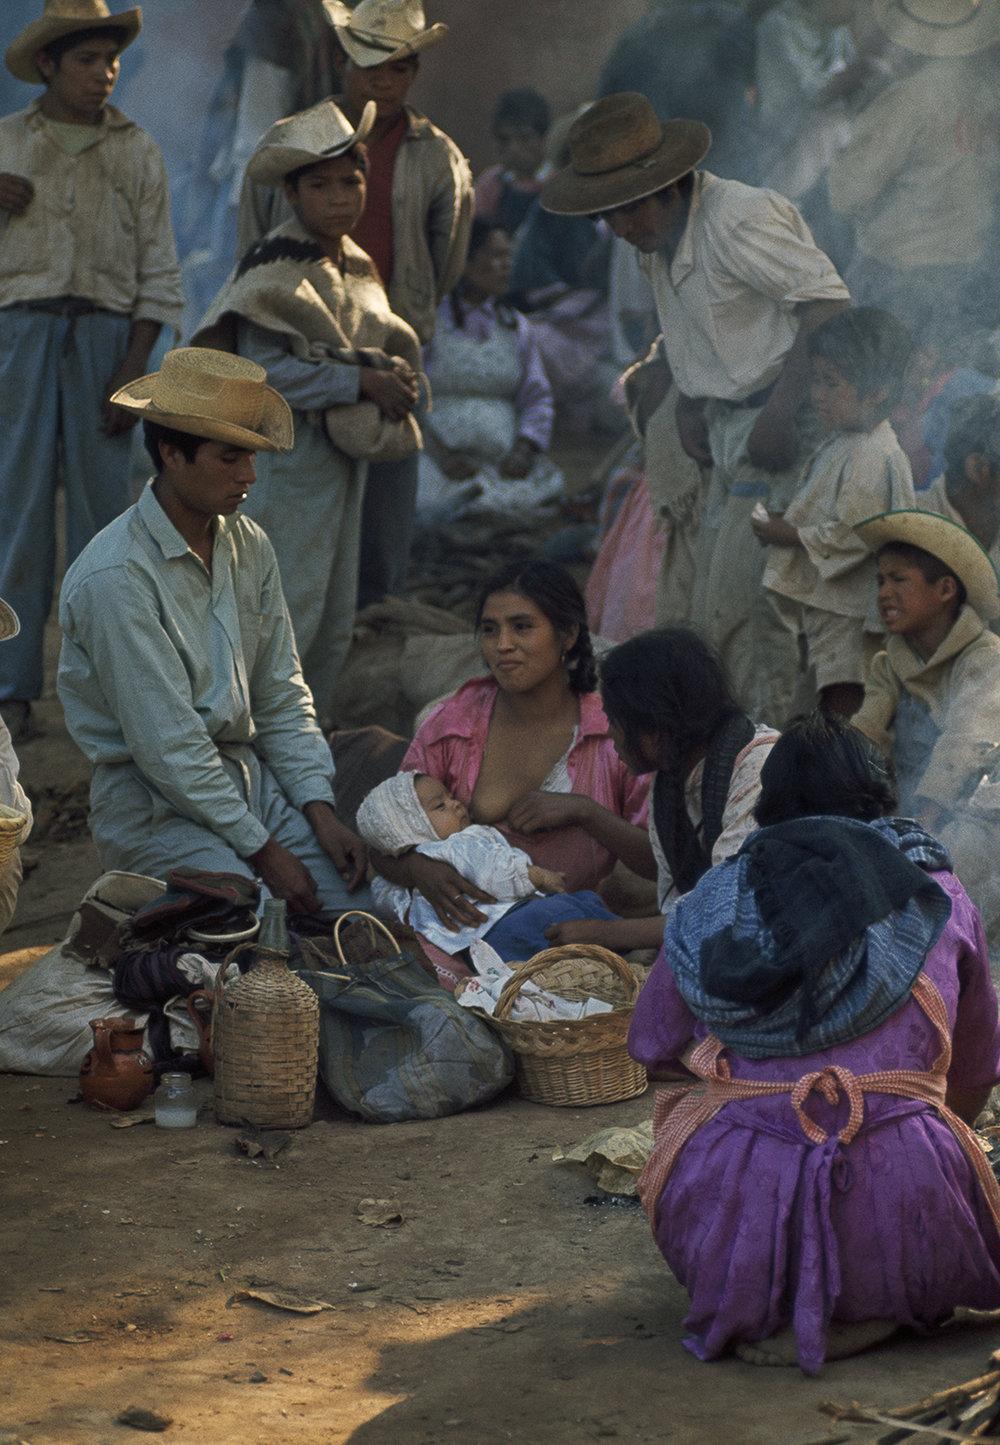 Valle de Bravo, Estado de México, 1967